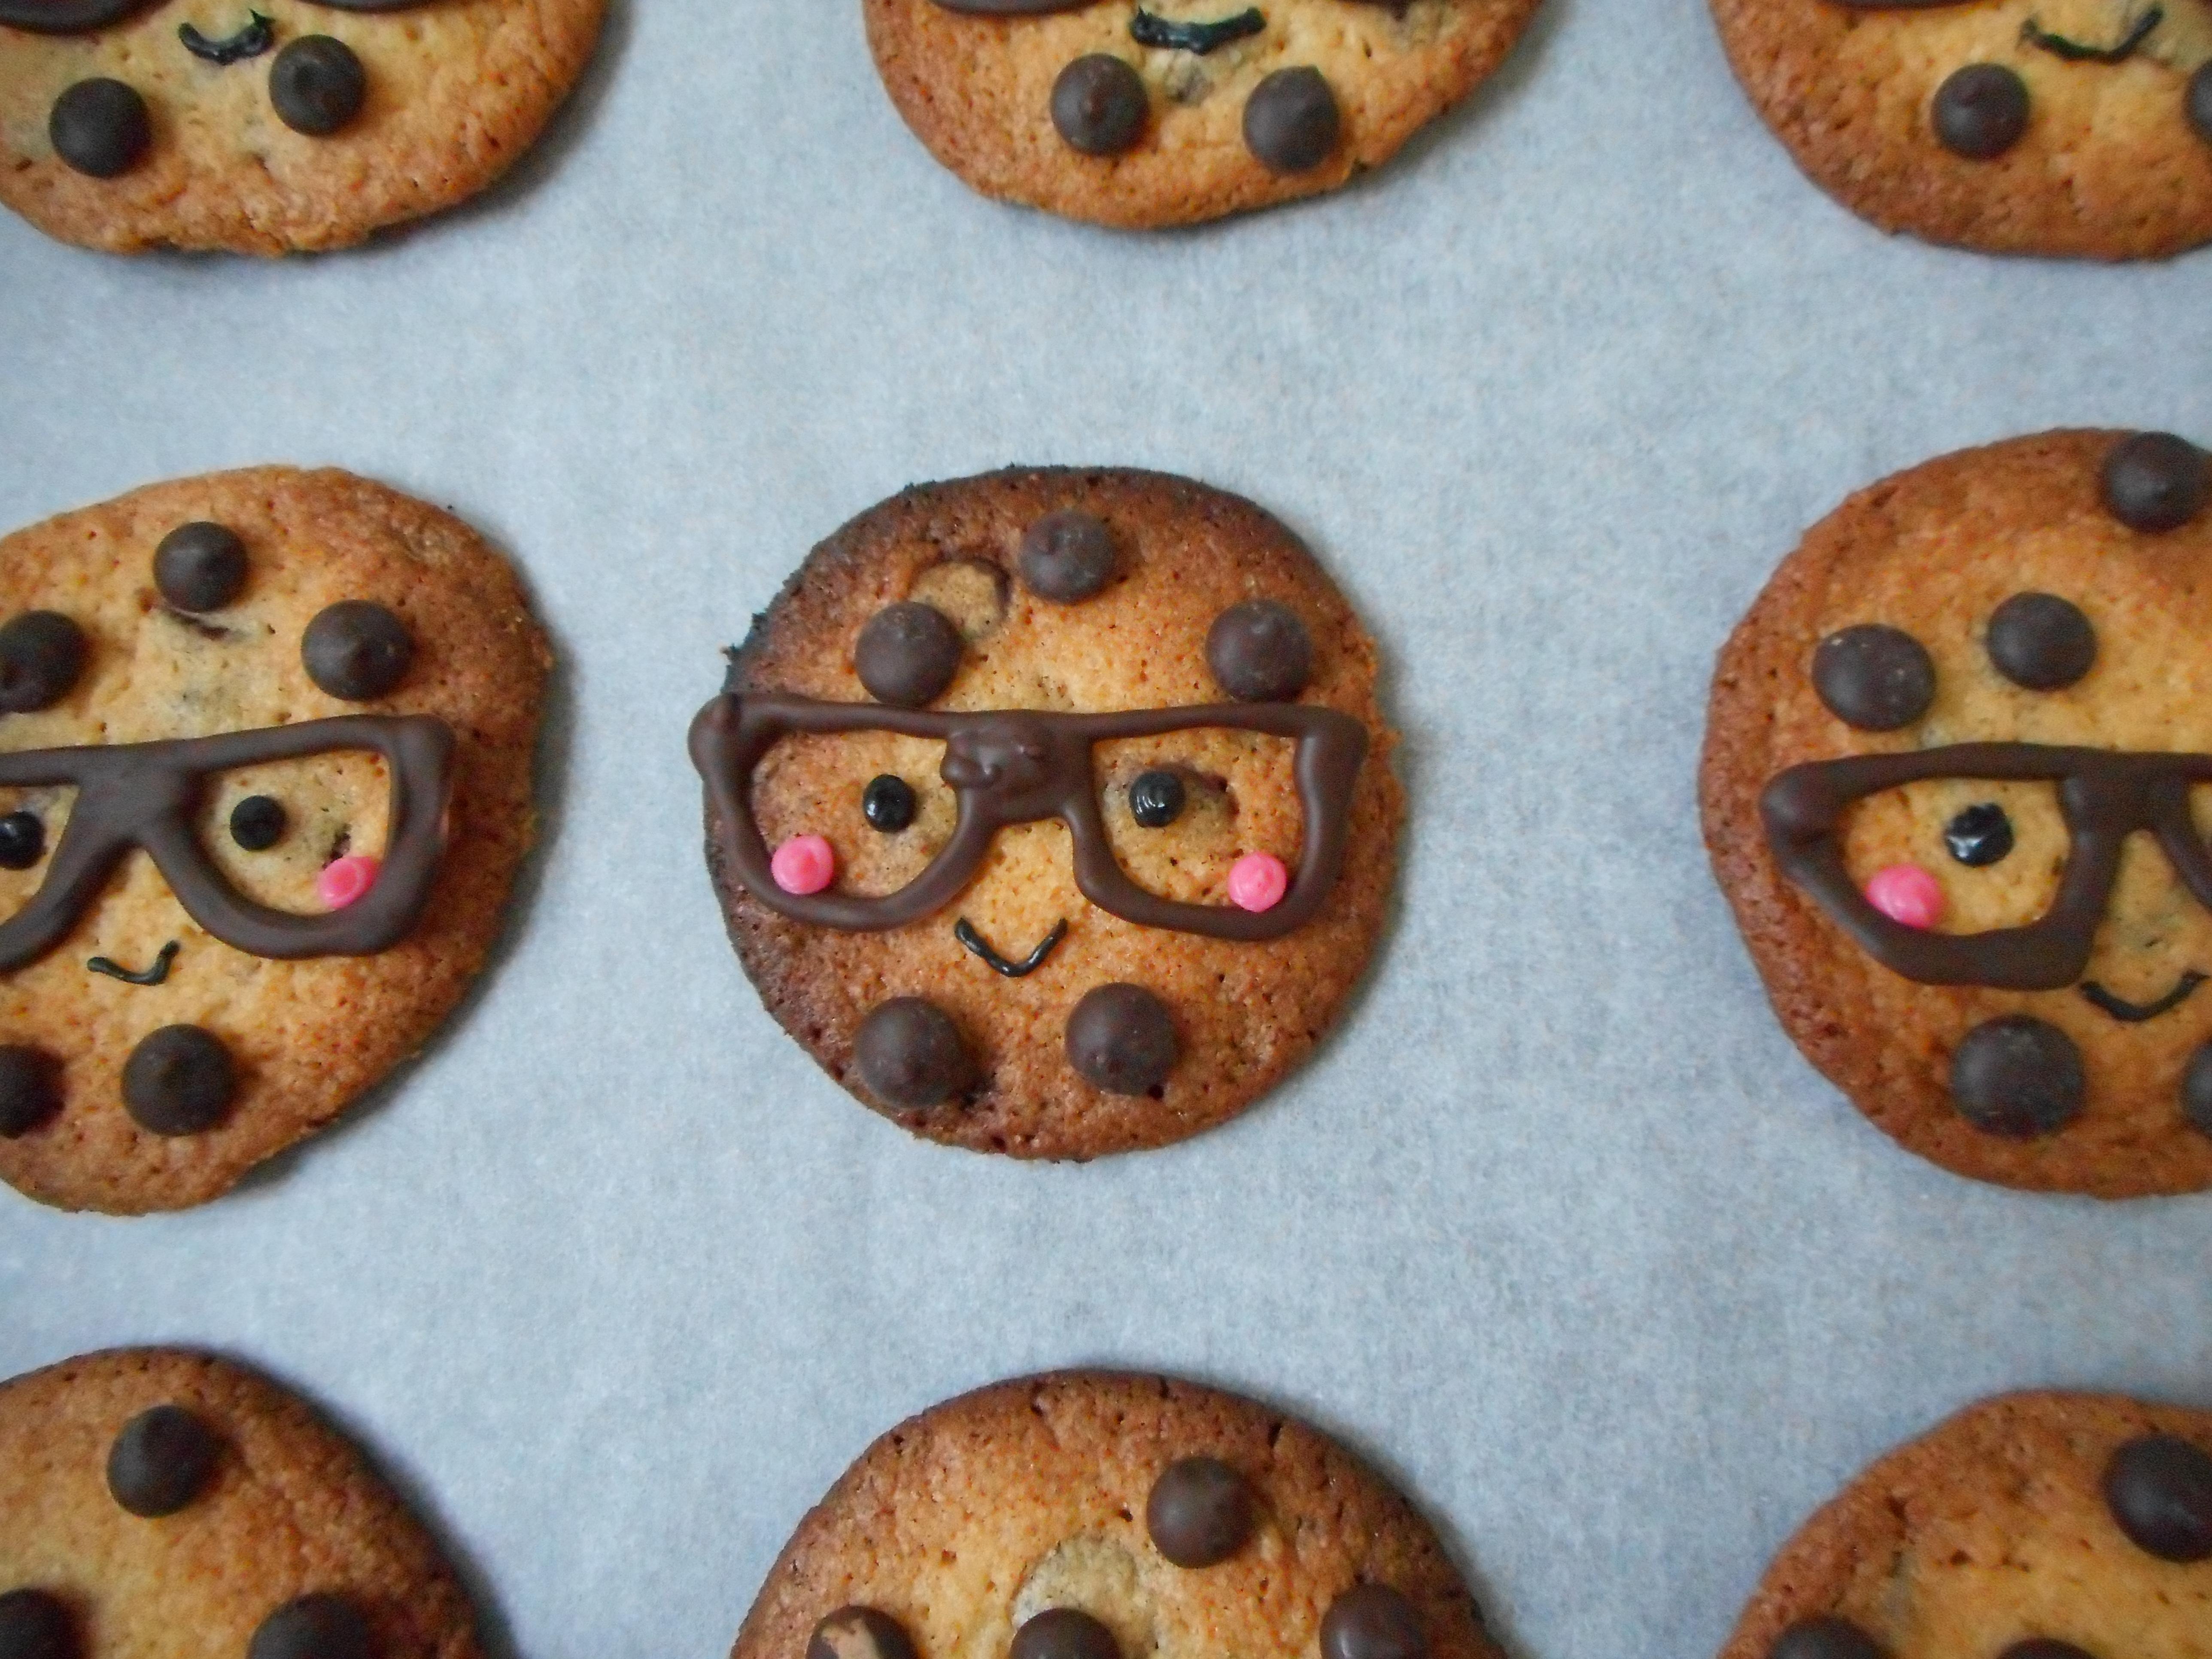 Nerdy Nummies Chocolate Chip Smart Cookies | Sarah's Little Kitchen